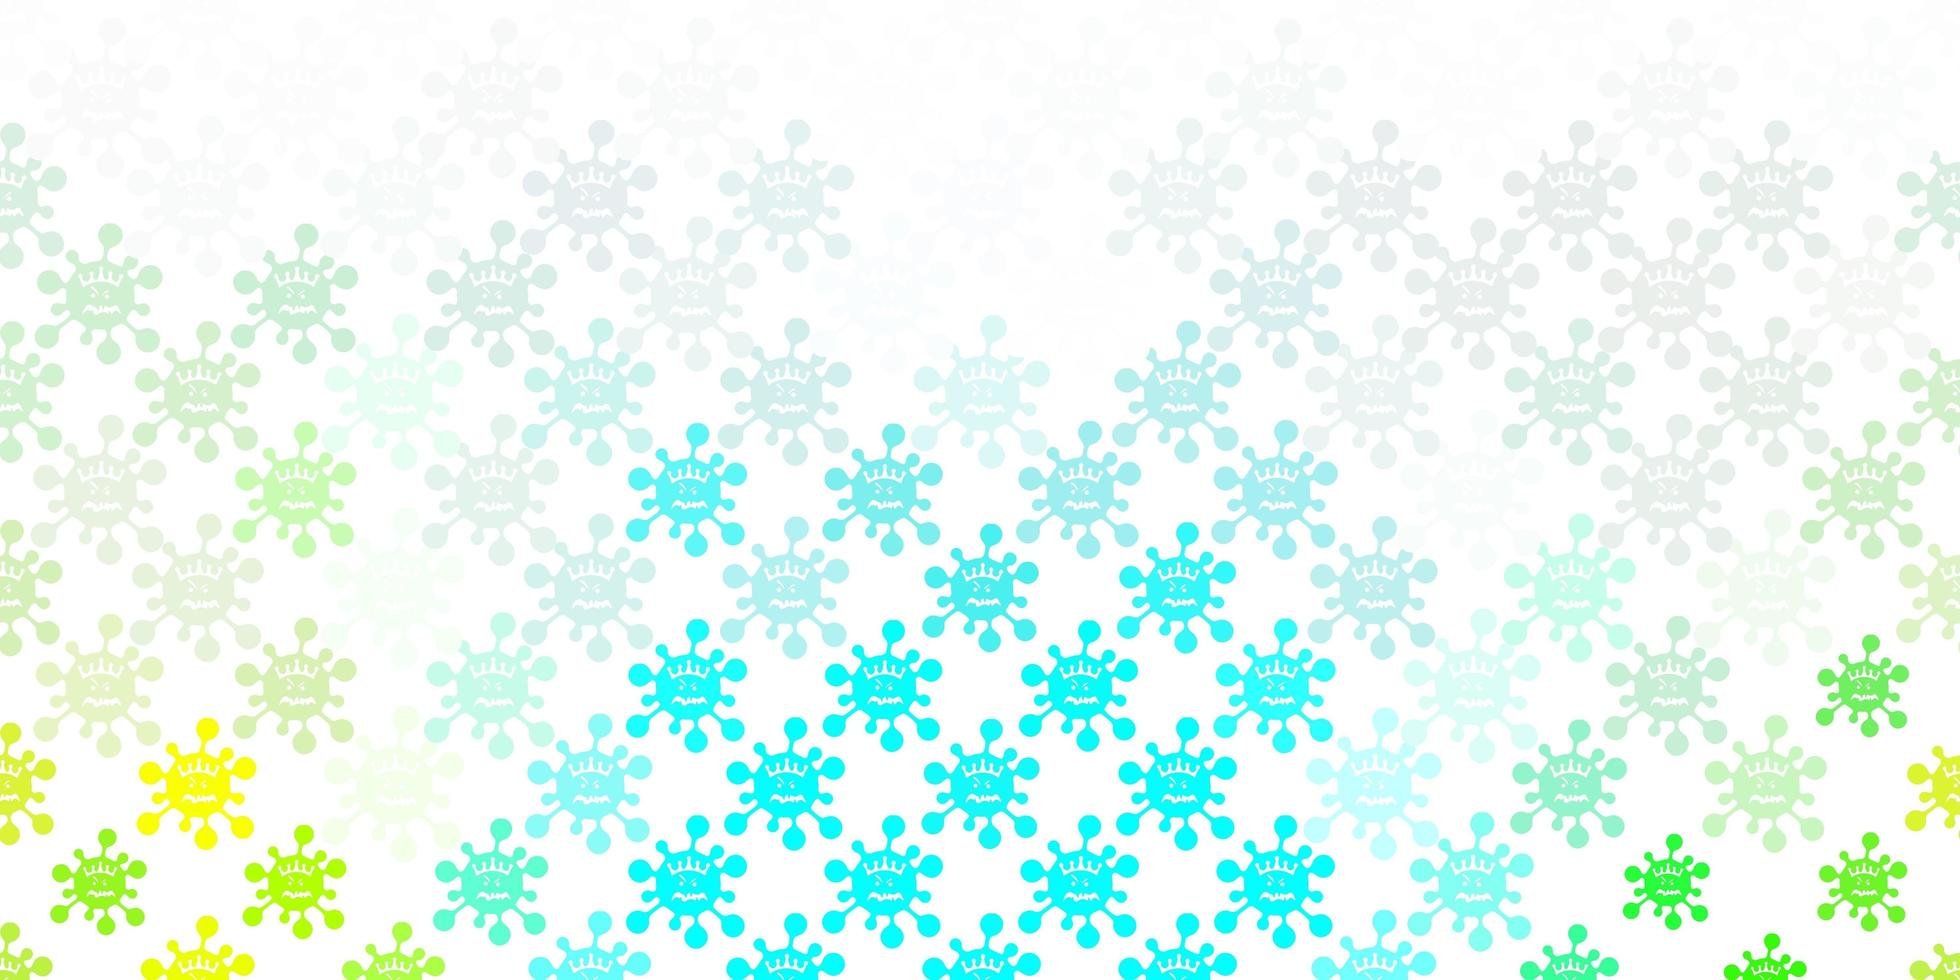 hellblaues, grünes Muster mit Coronavirus-Elementen. vektor